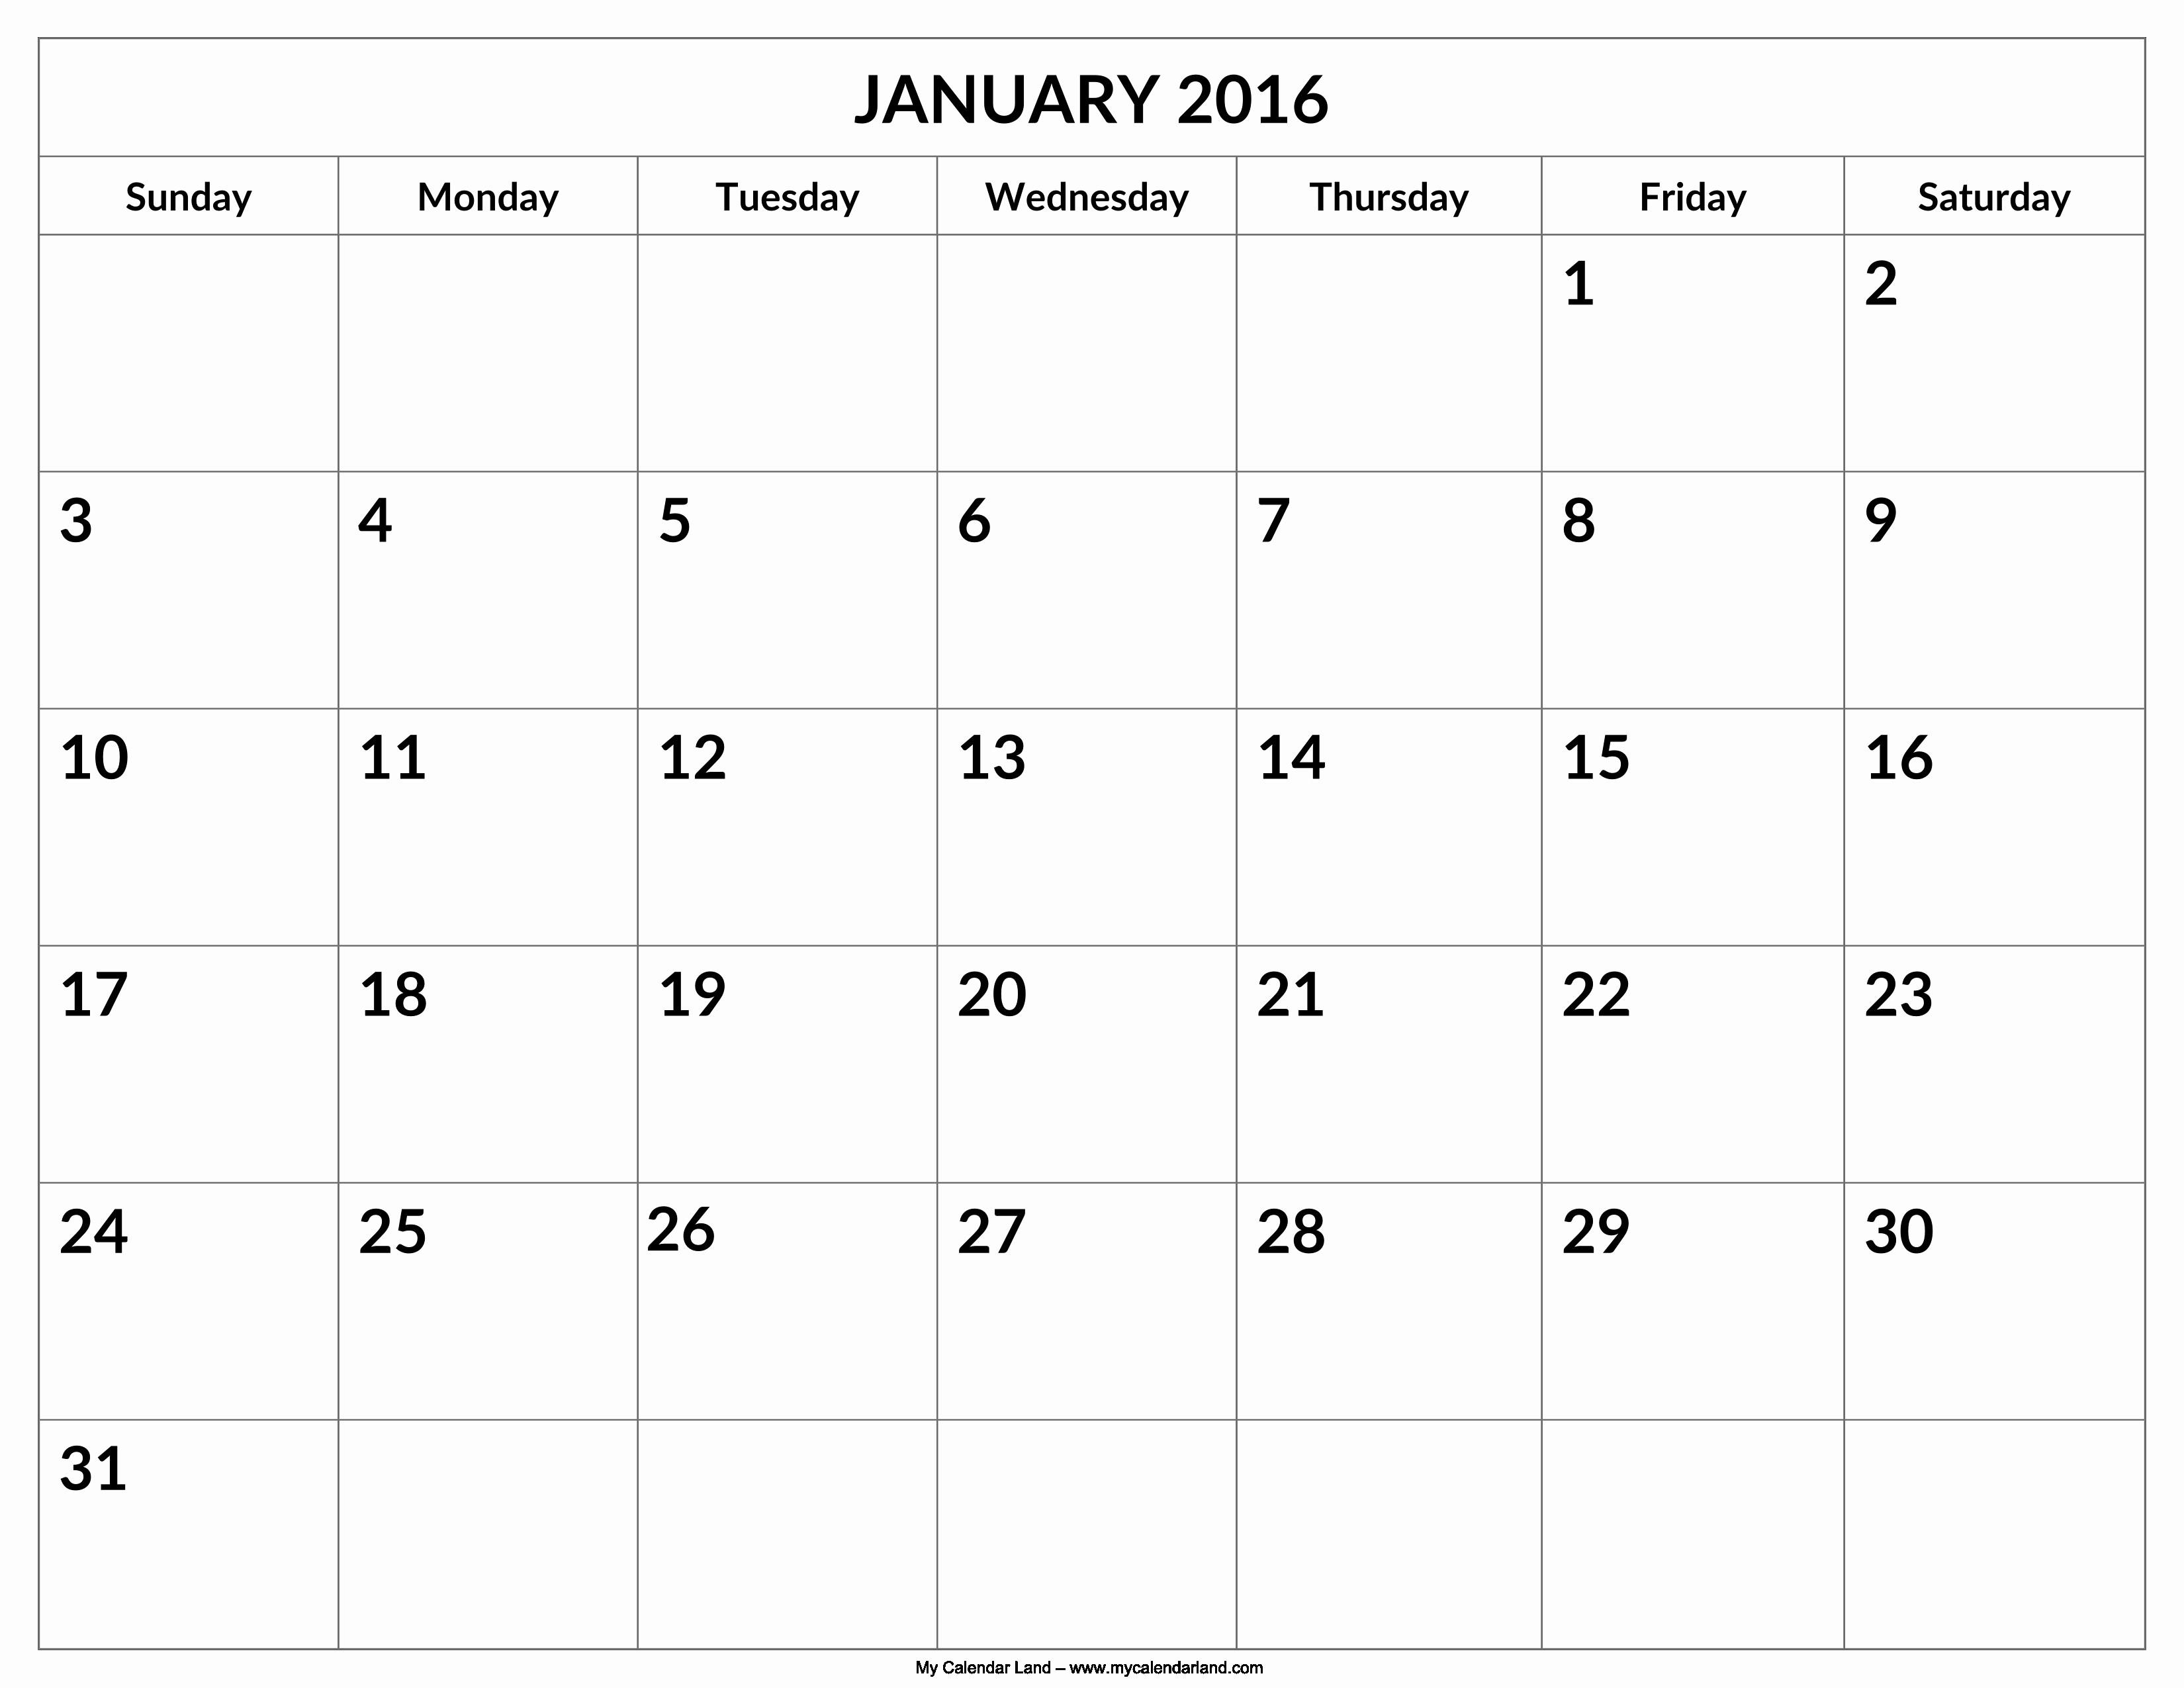 Calendar 2016 to Write On Fresh 2016 Calendar with Space to Write